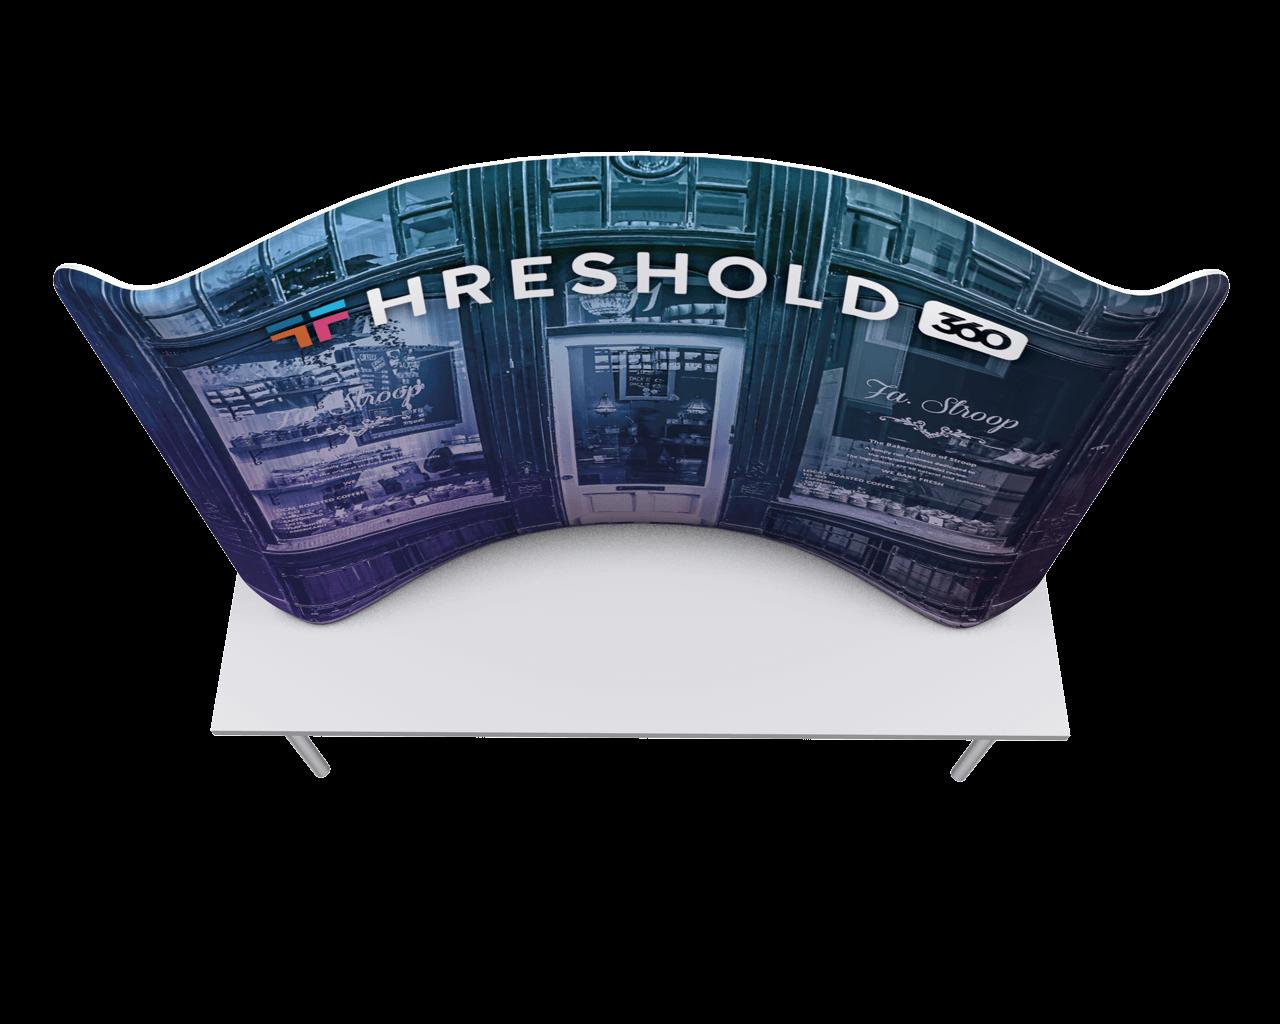 Waveline 8ft Tabletop Display